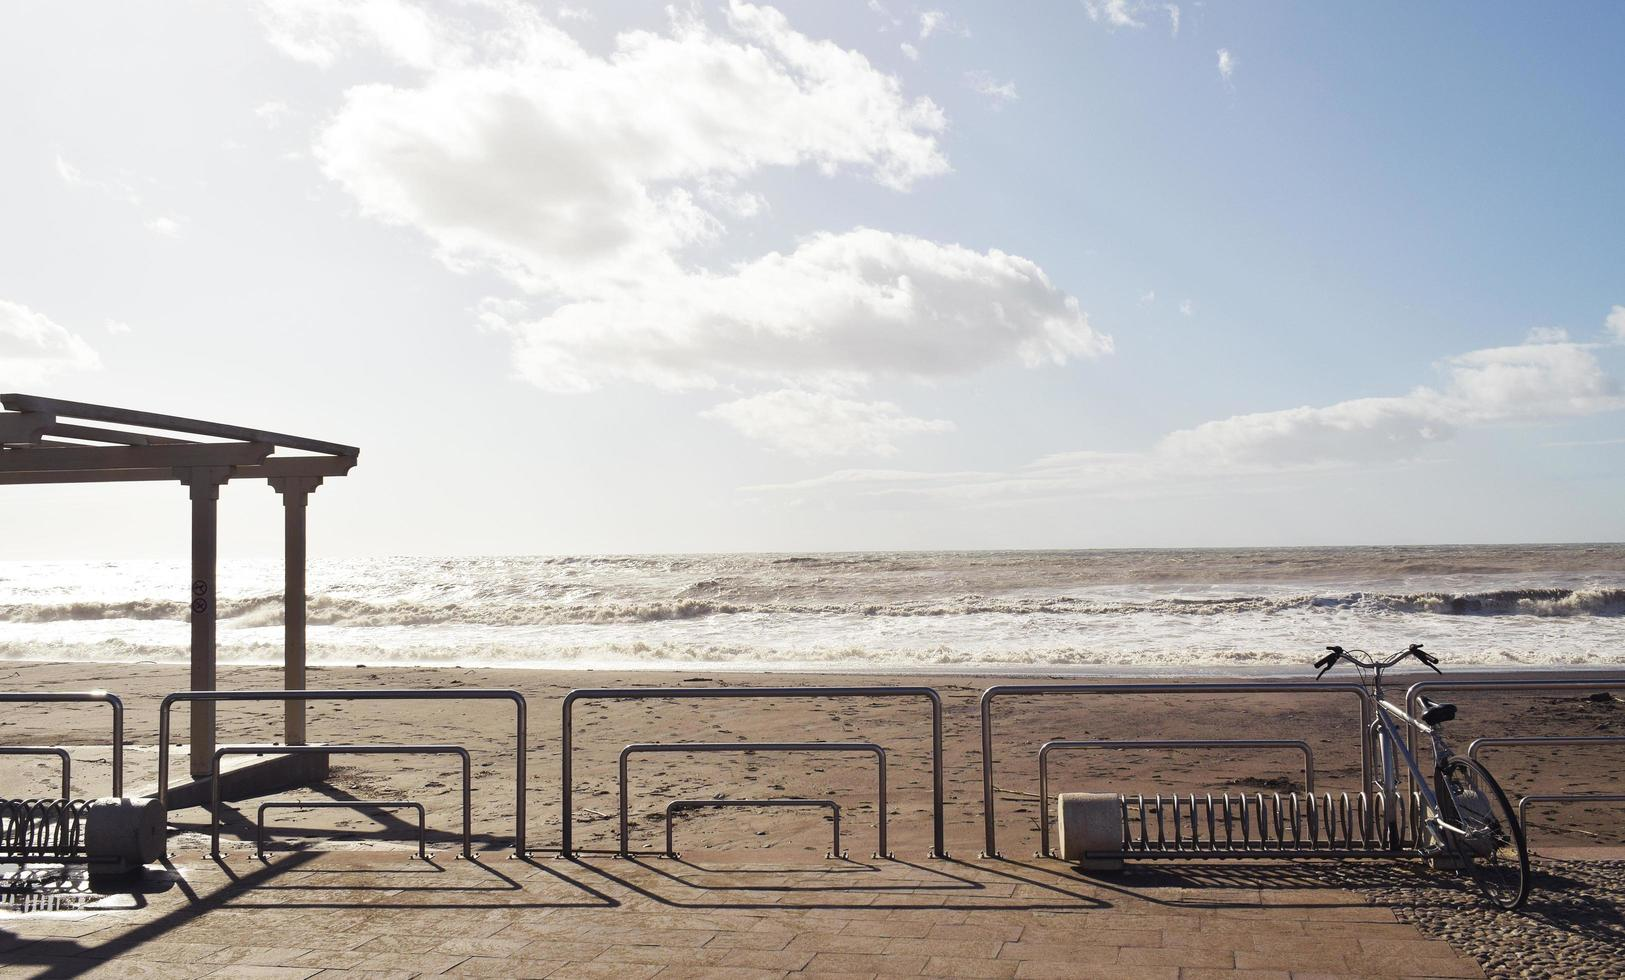 Bike fence on beach during daytime photo